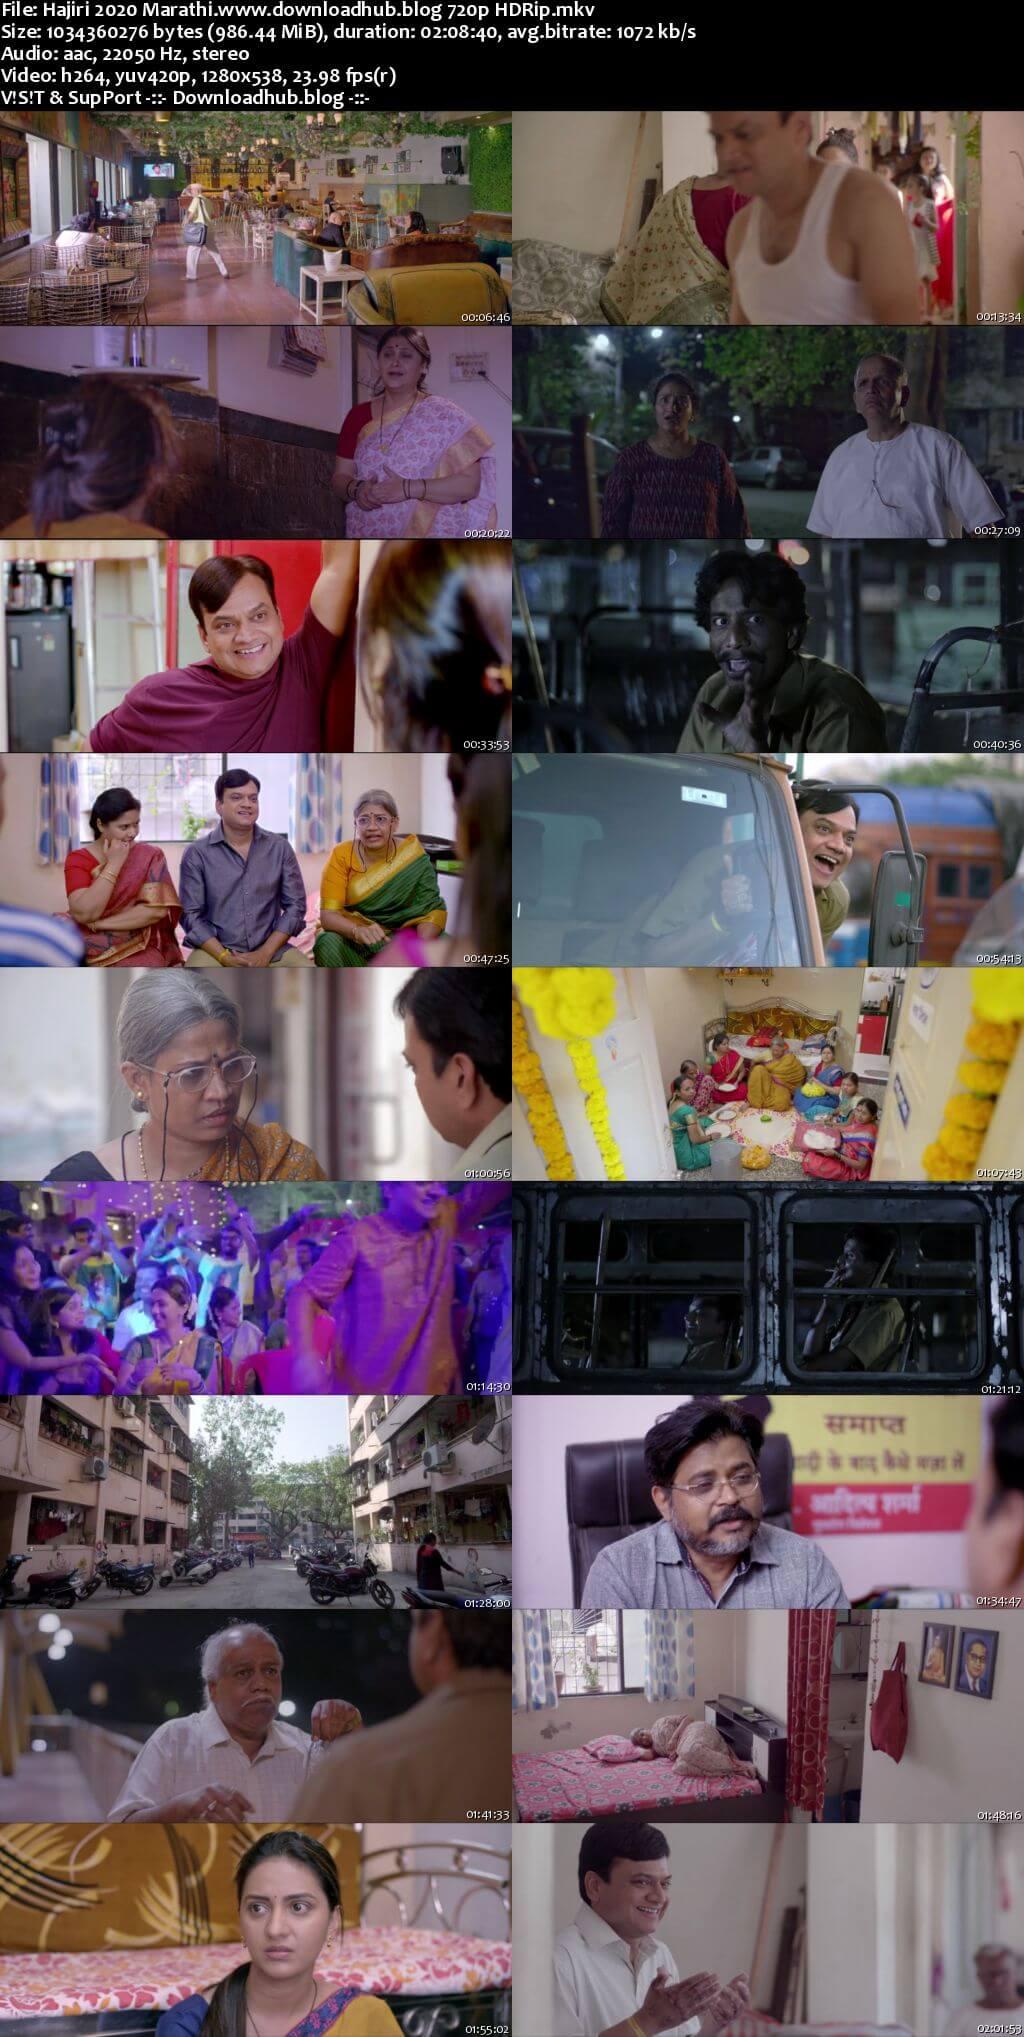 Hajiri 2020 Marathi 720p HDRip x264